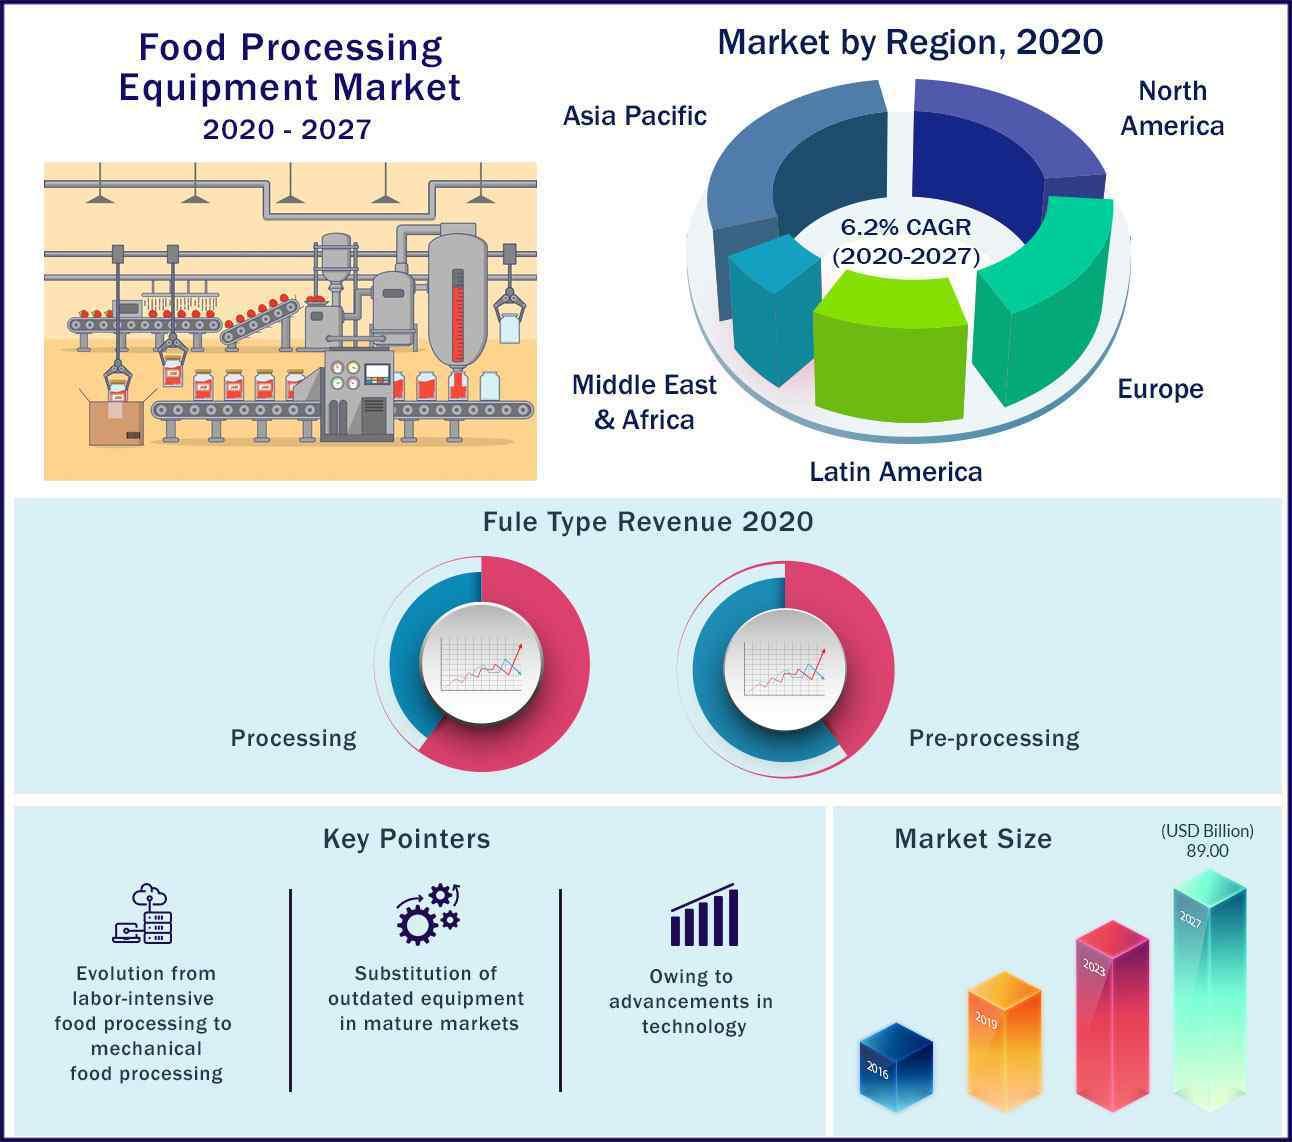 Global Food Processing Equipment Market 2020-2027